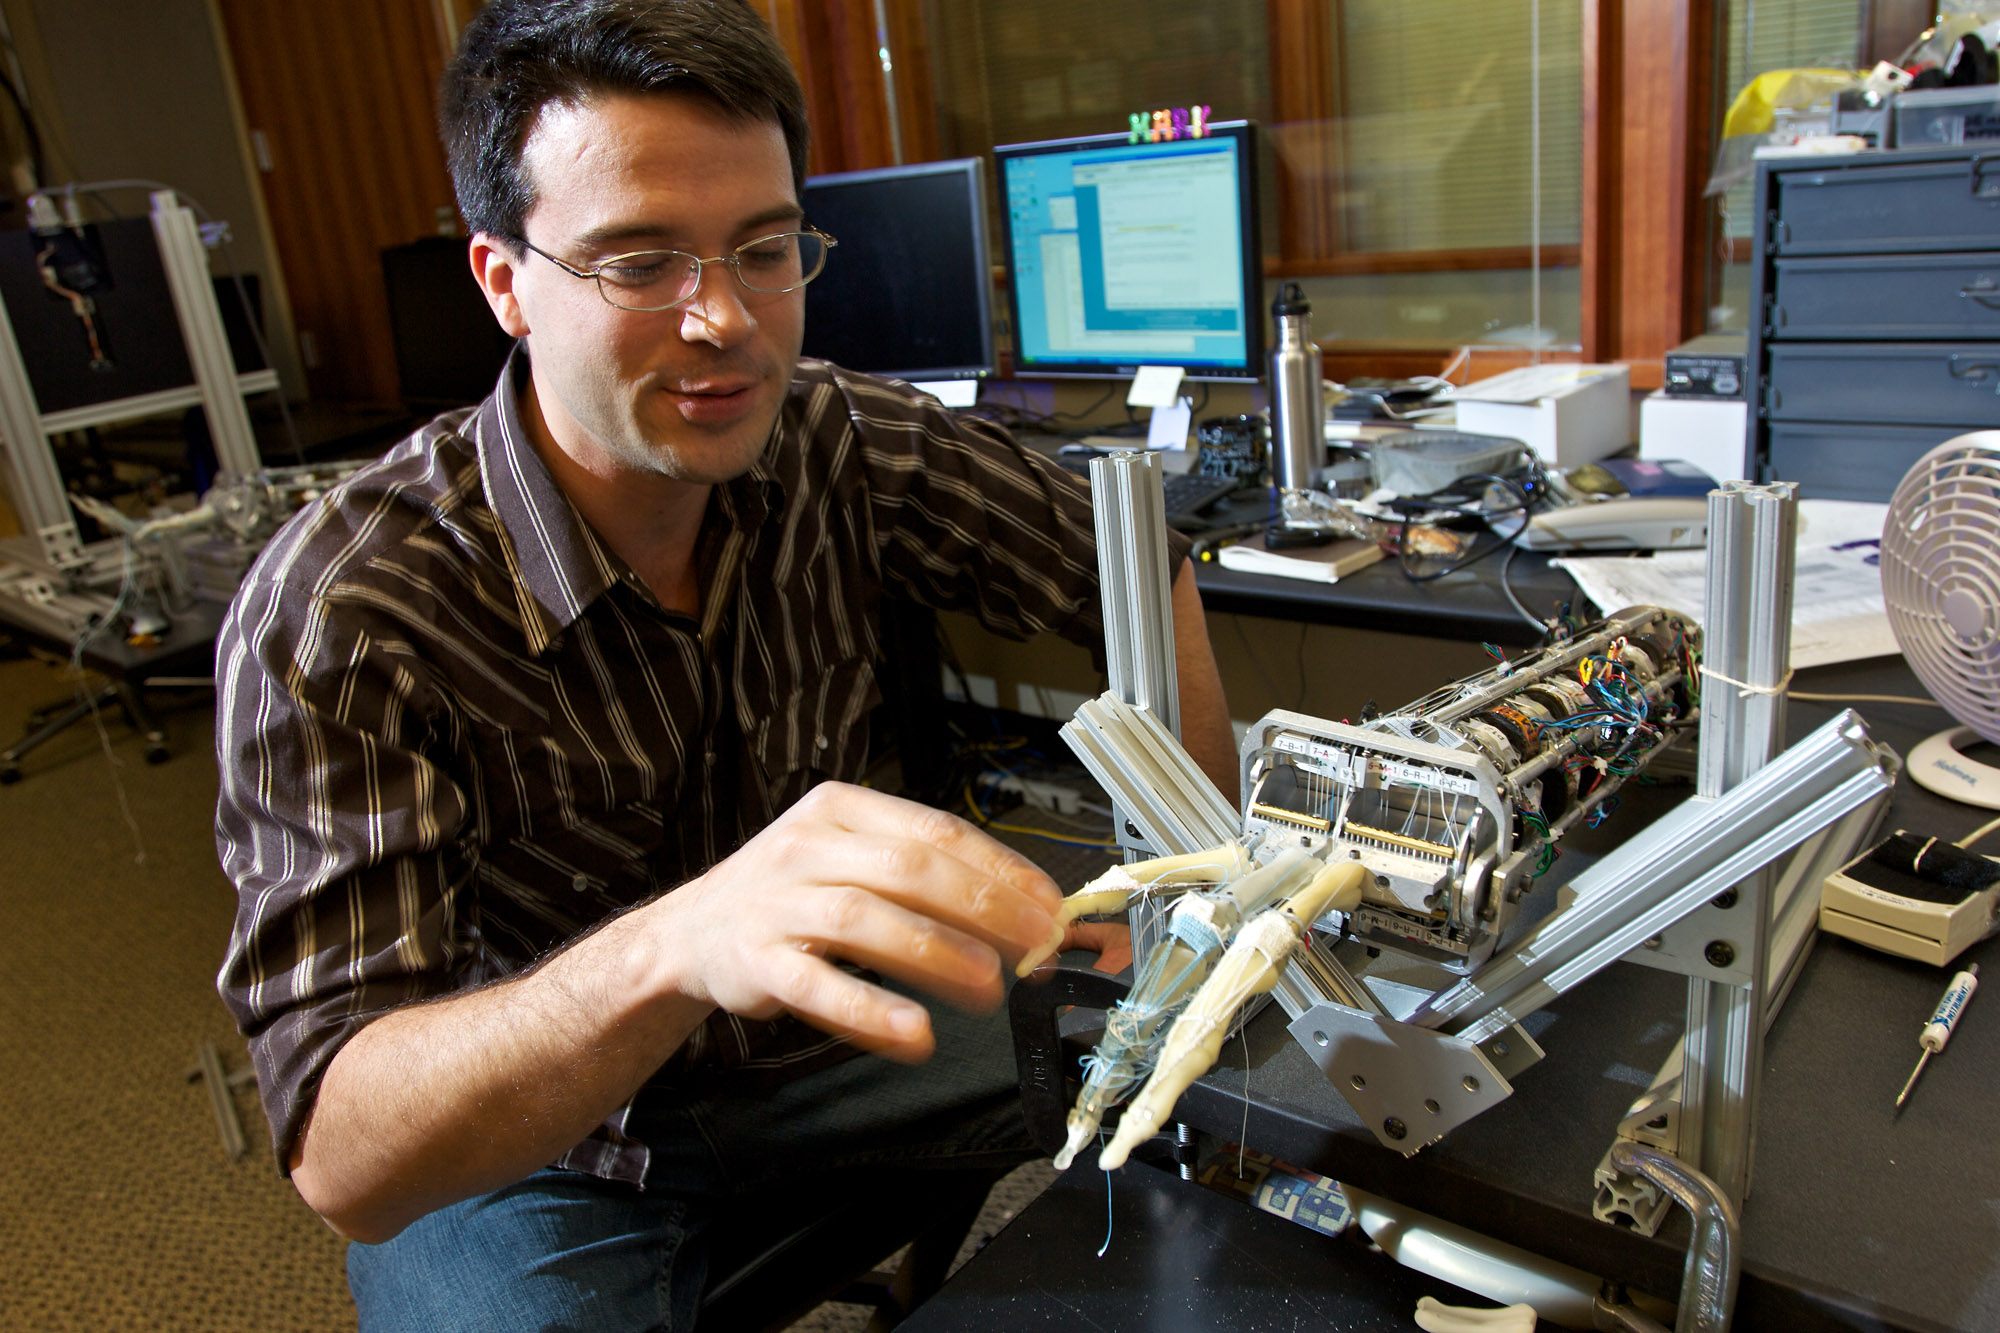 UW doctoral student Eric Rombokas with a prototype prosthesis built in the Neurobotics Lab.